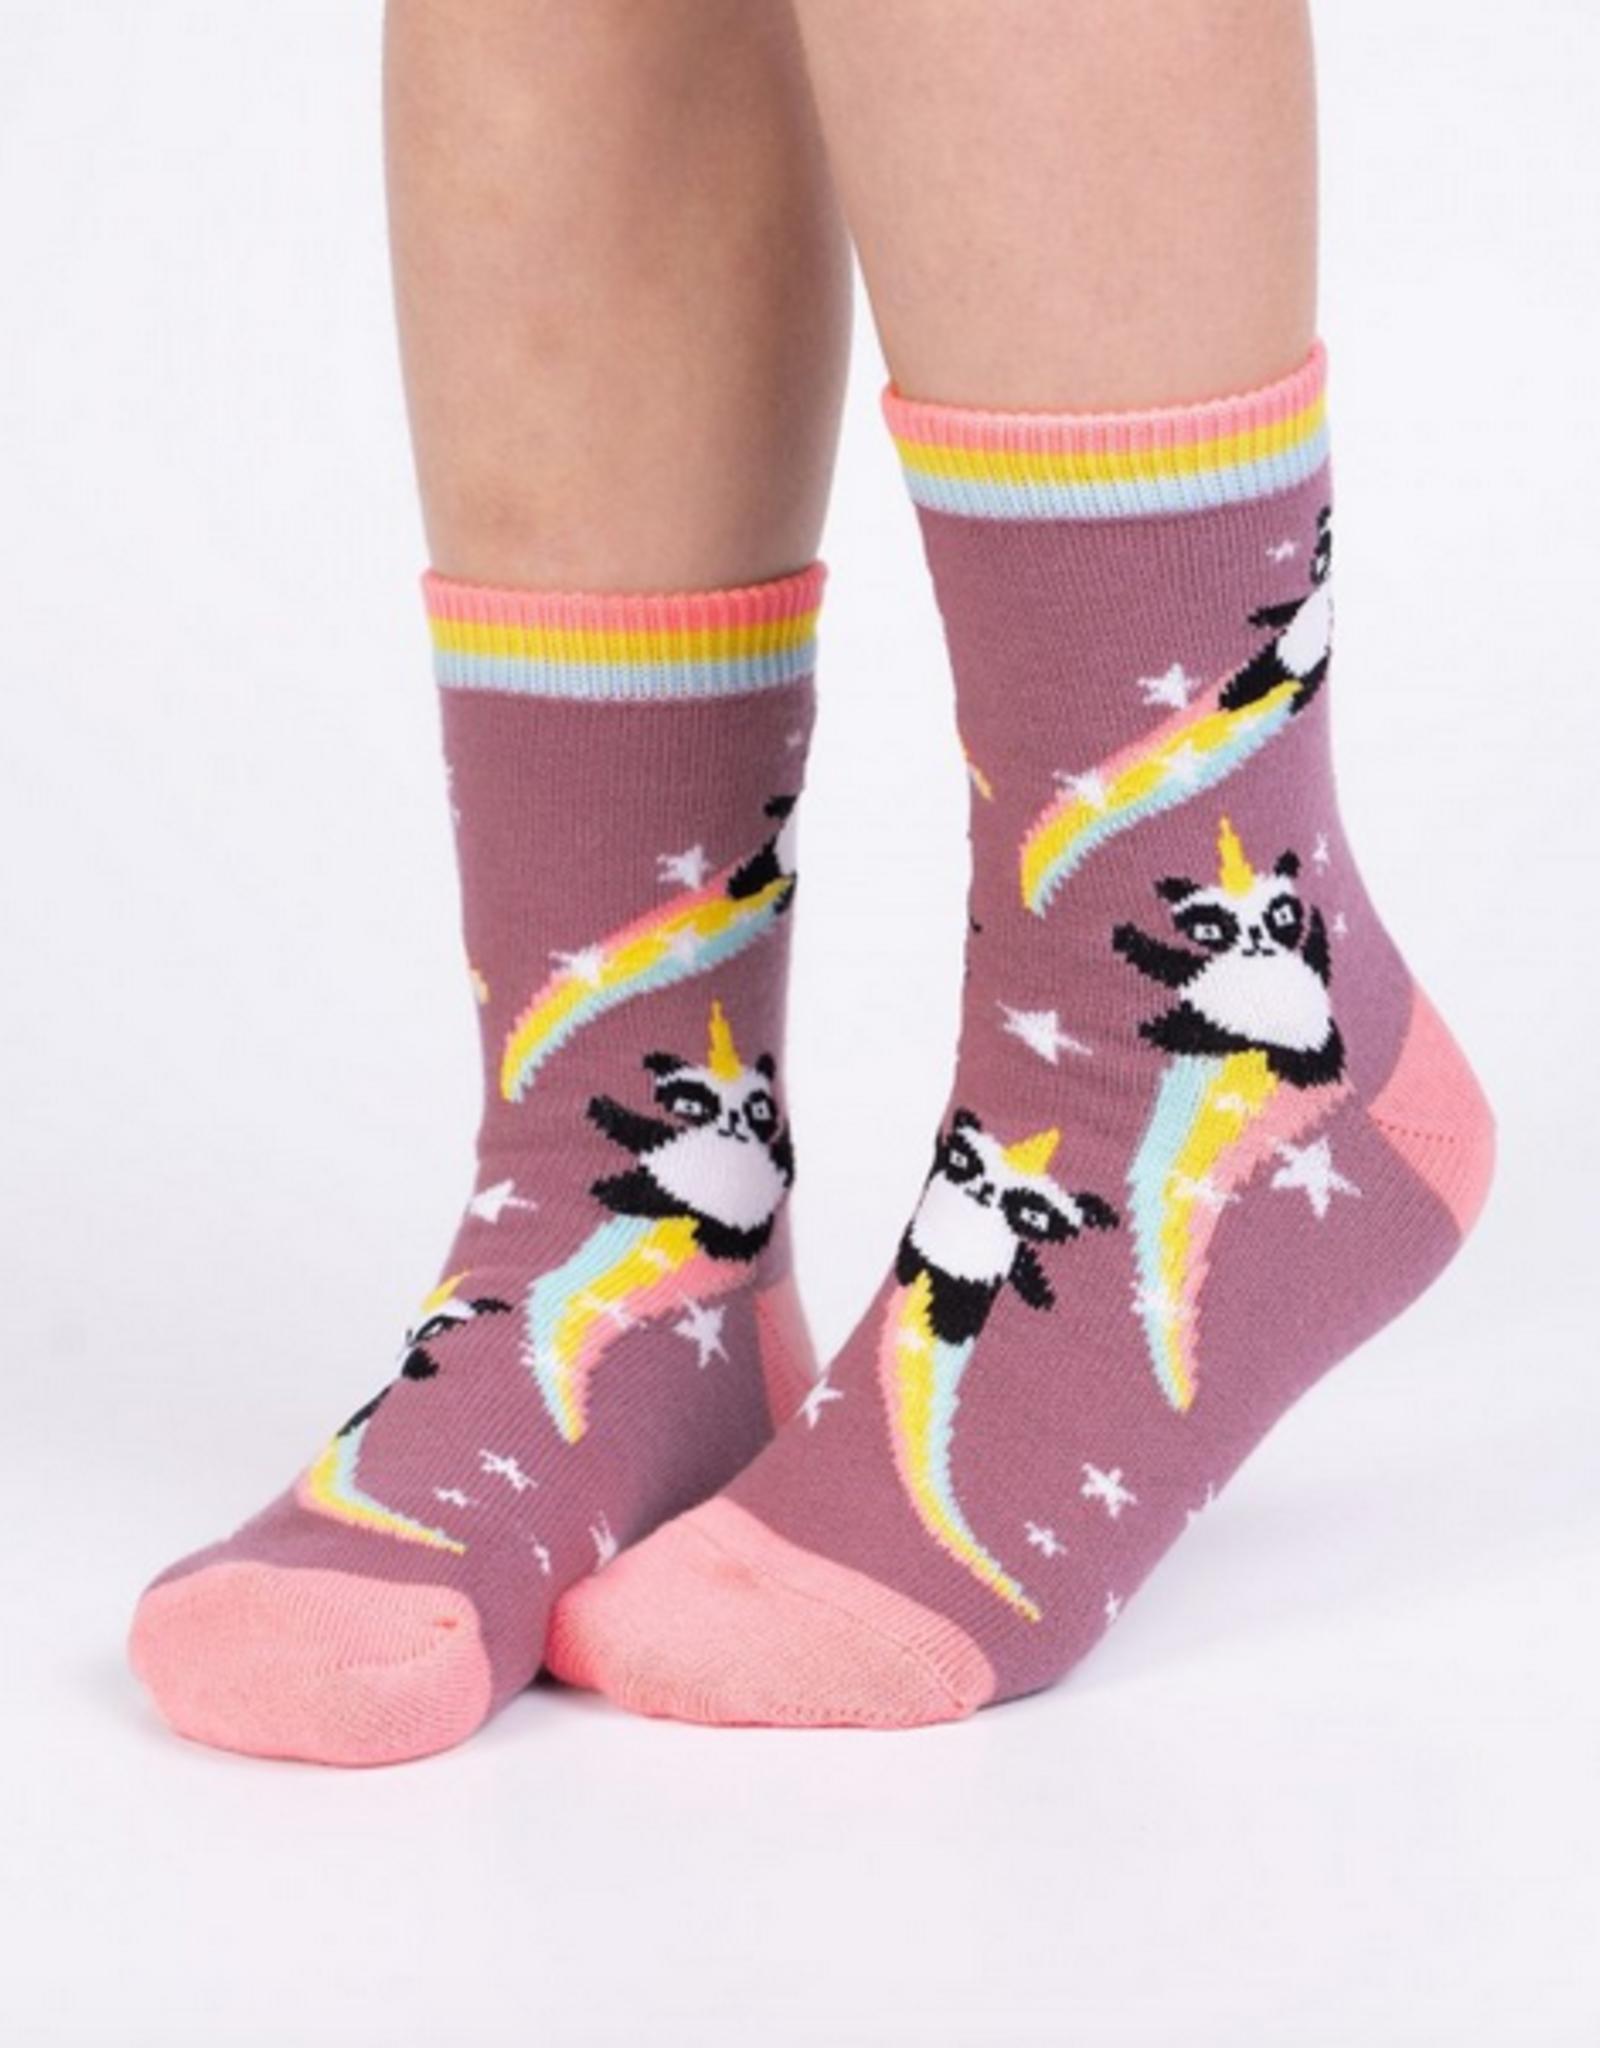 Sock It To Me Kids' Crew Socks